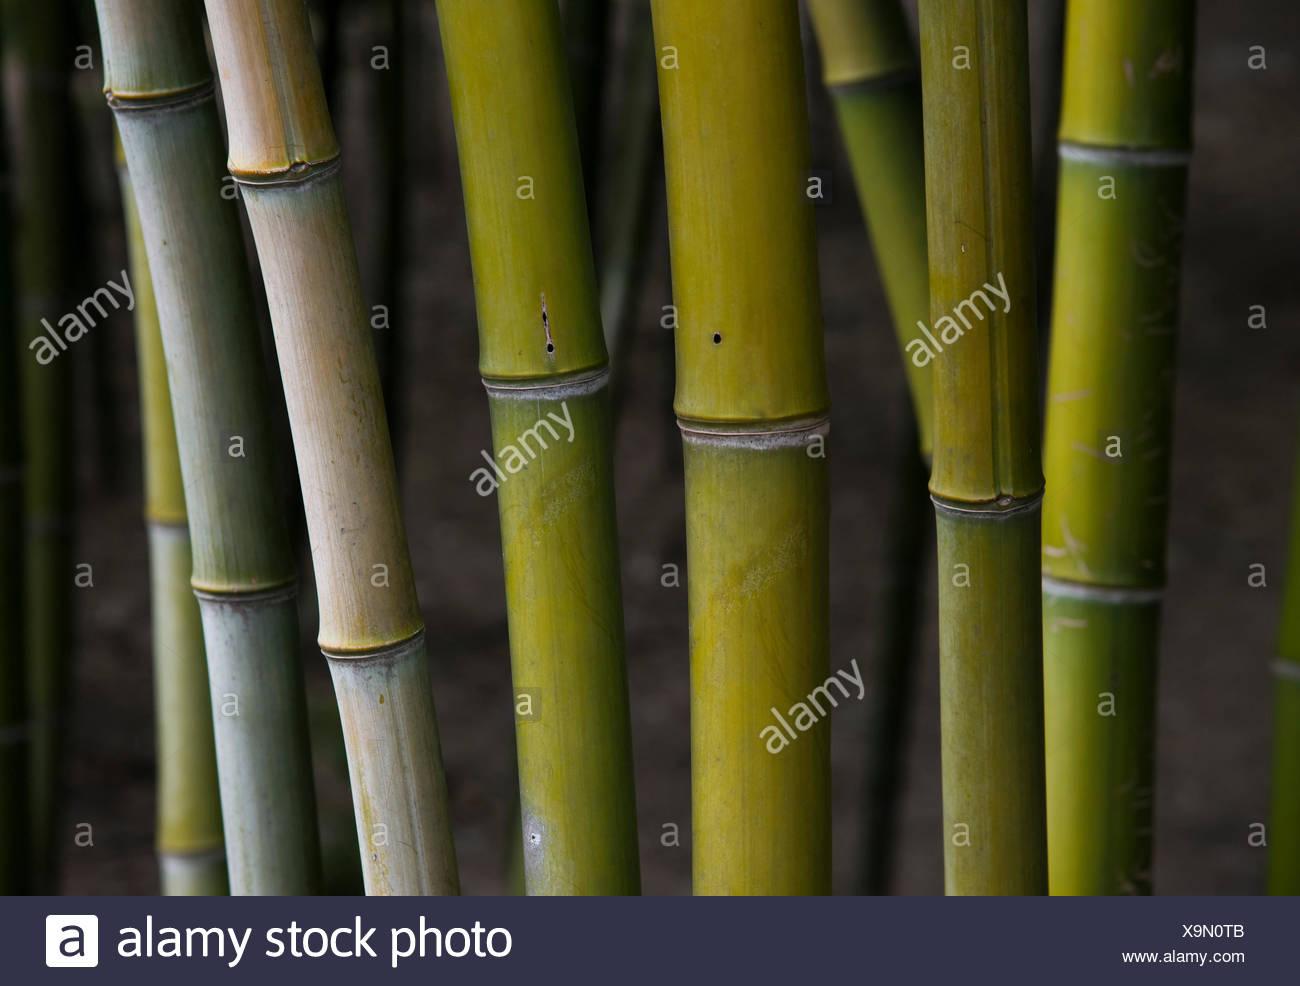 Bamboo stems, bamboo forest, Wuzhen, China - Stock Image